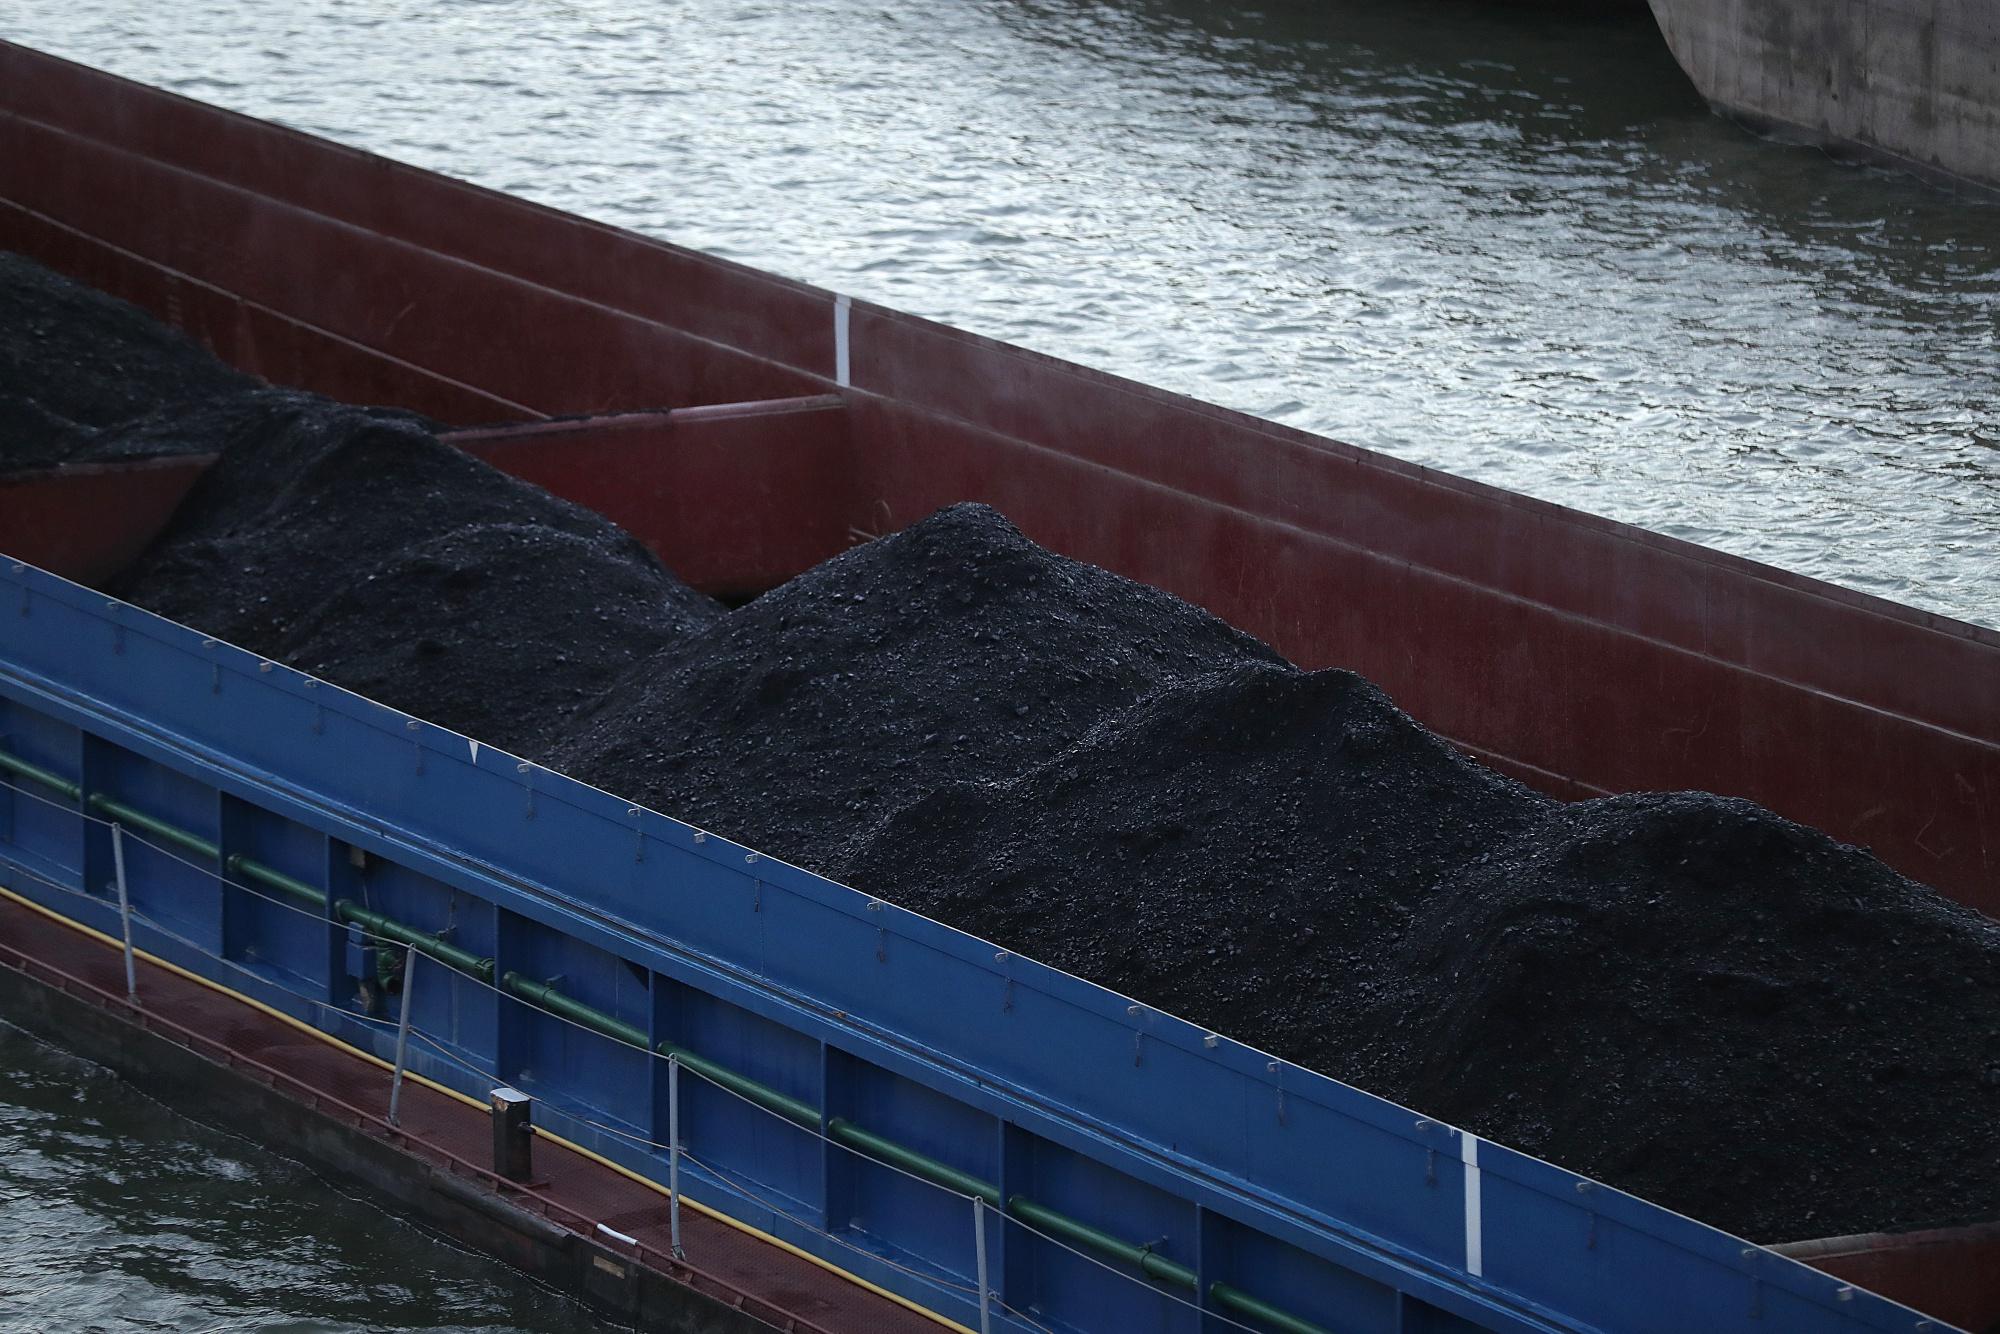 bloomberg.com - Brian Parkin - Merkel Seeks to Heal Coal Rift in Germany